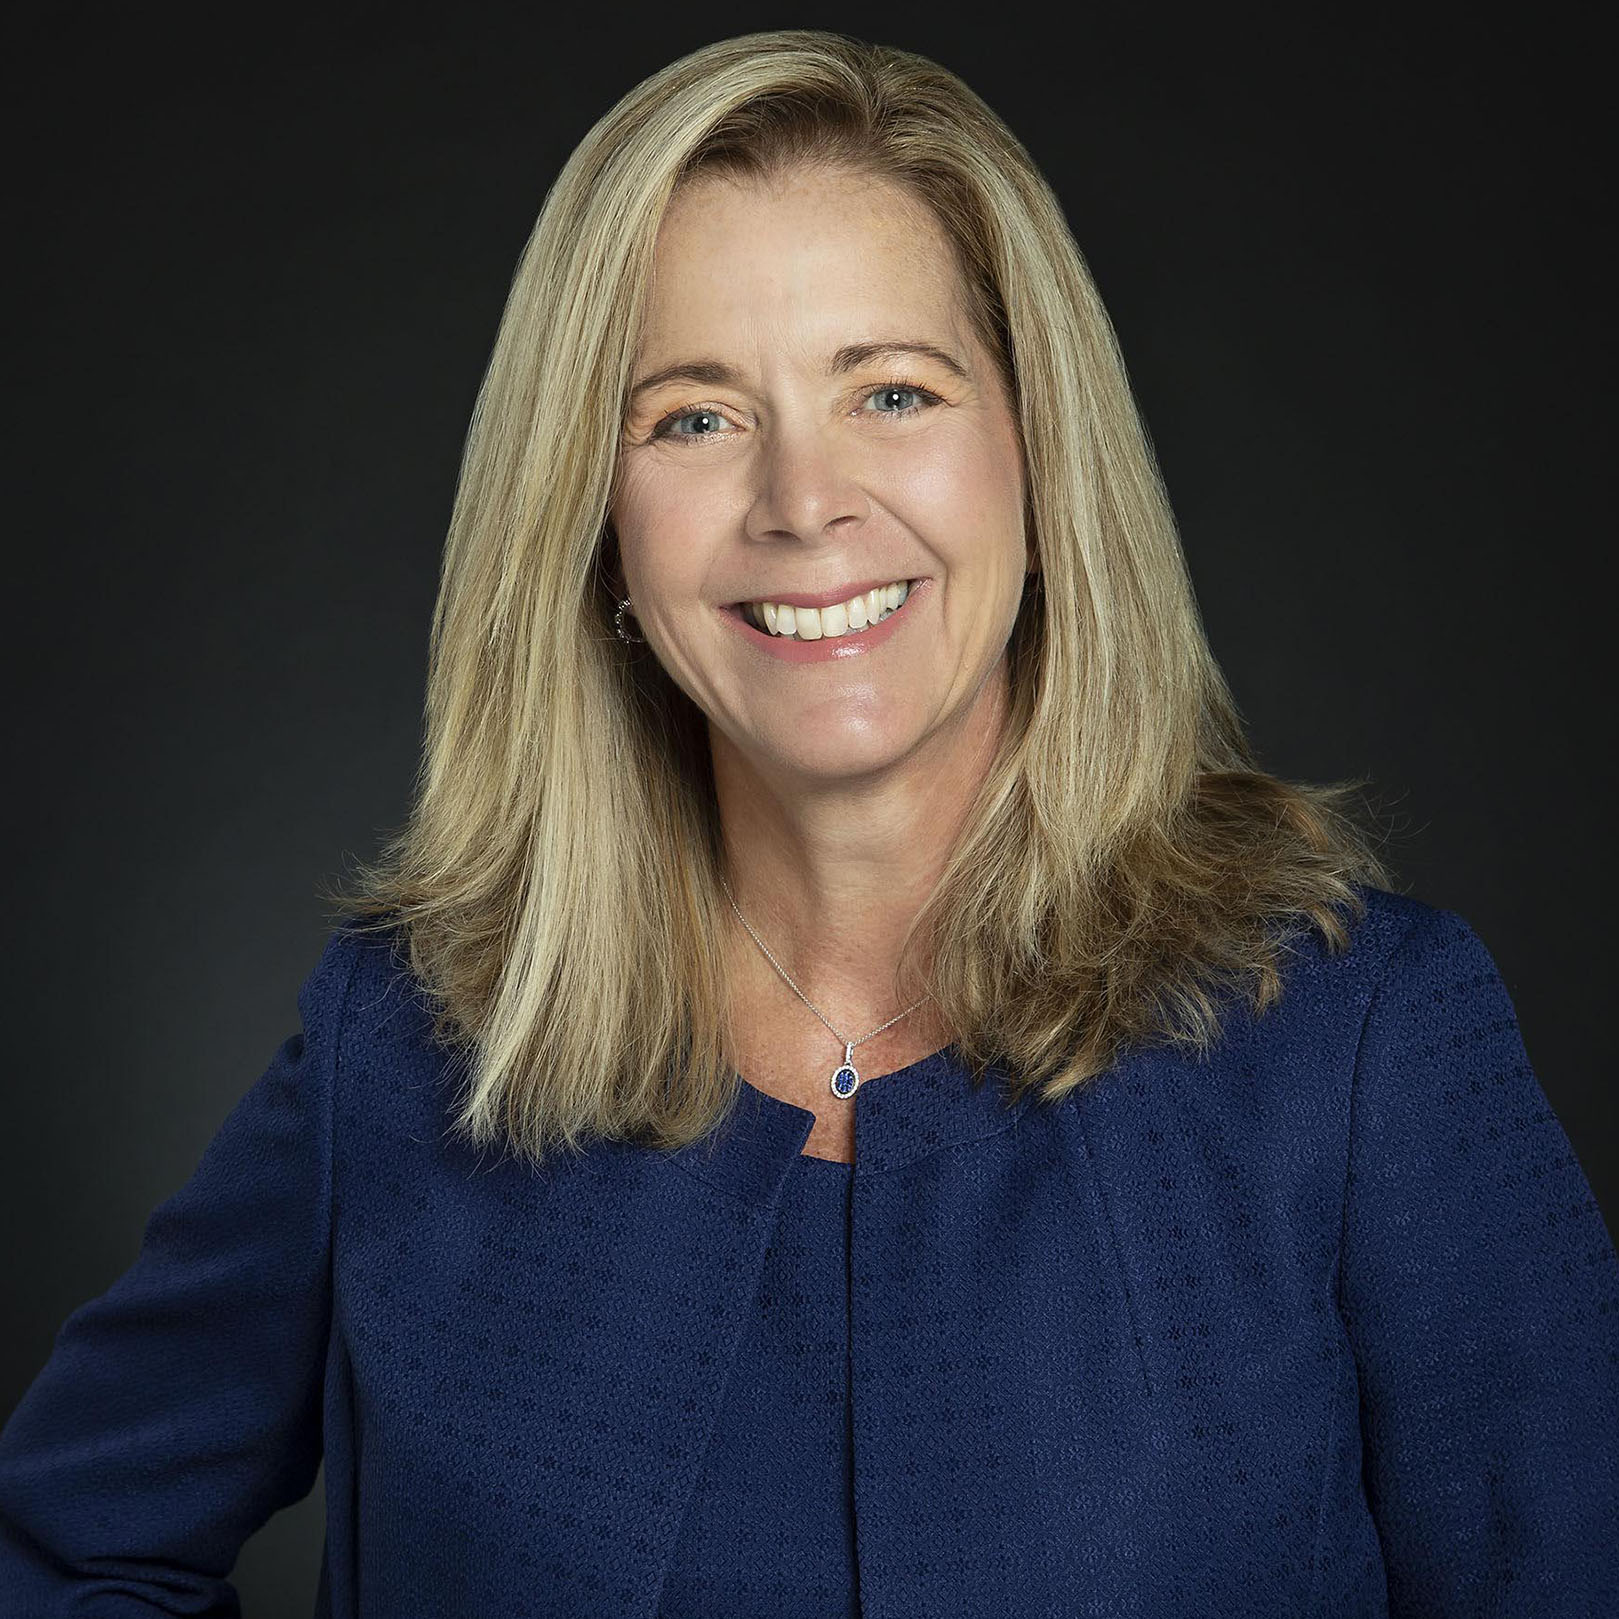 Jennifer Vigne, President & CEO